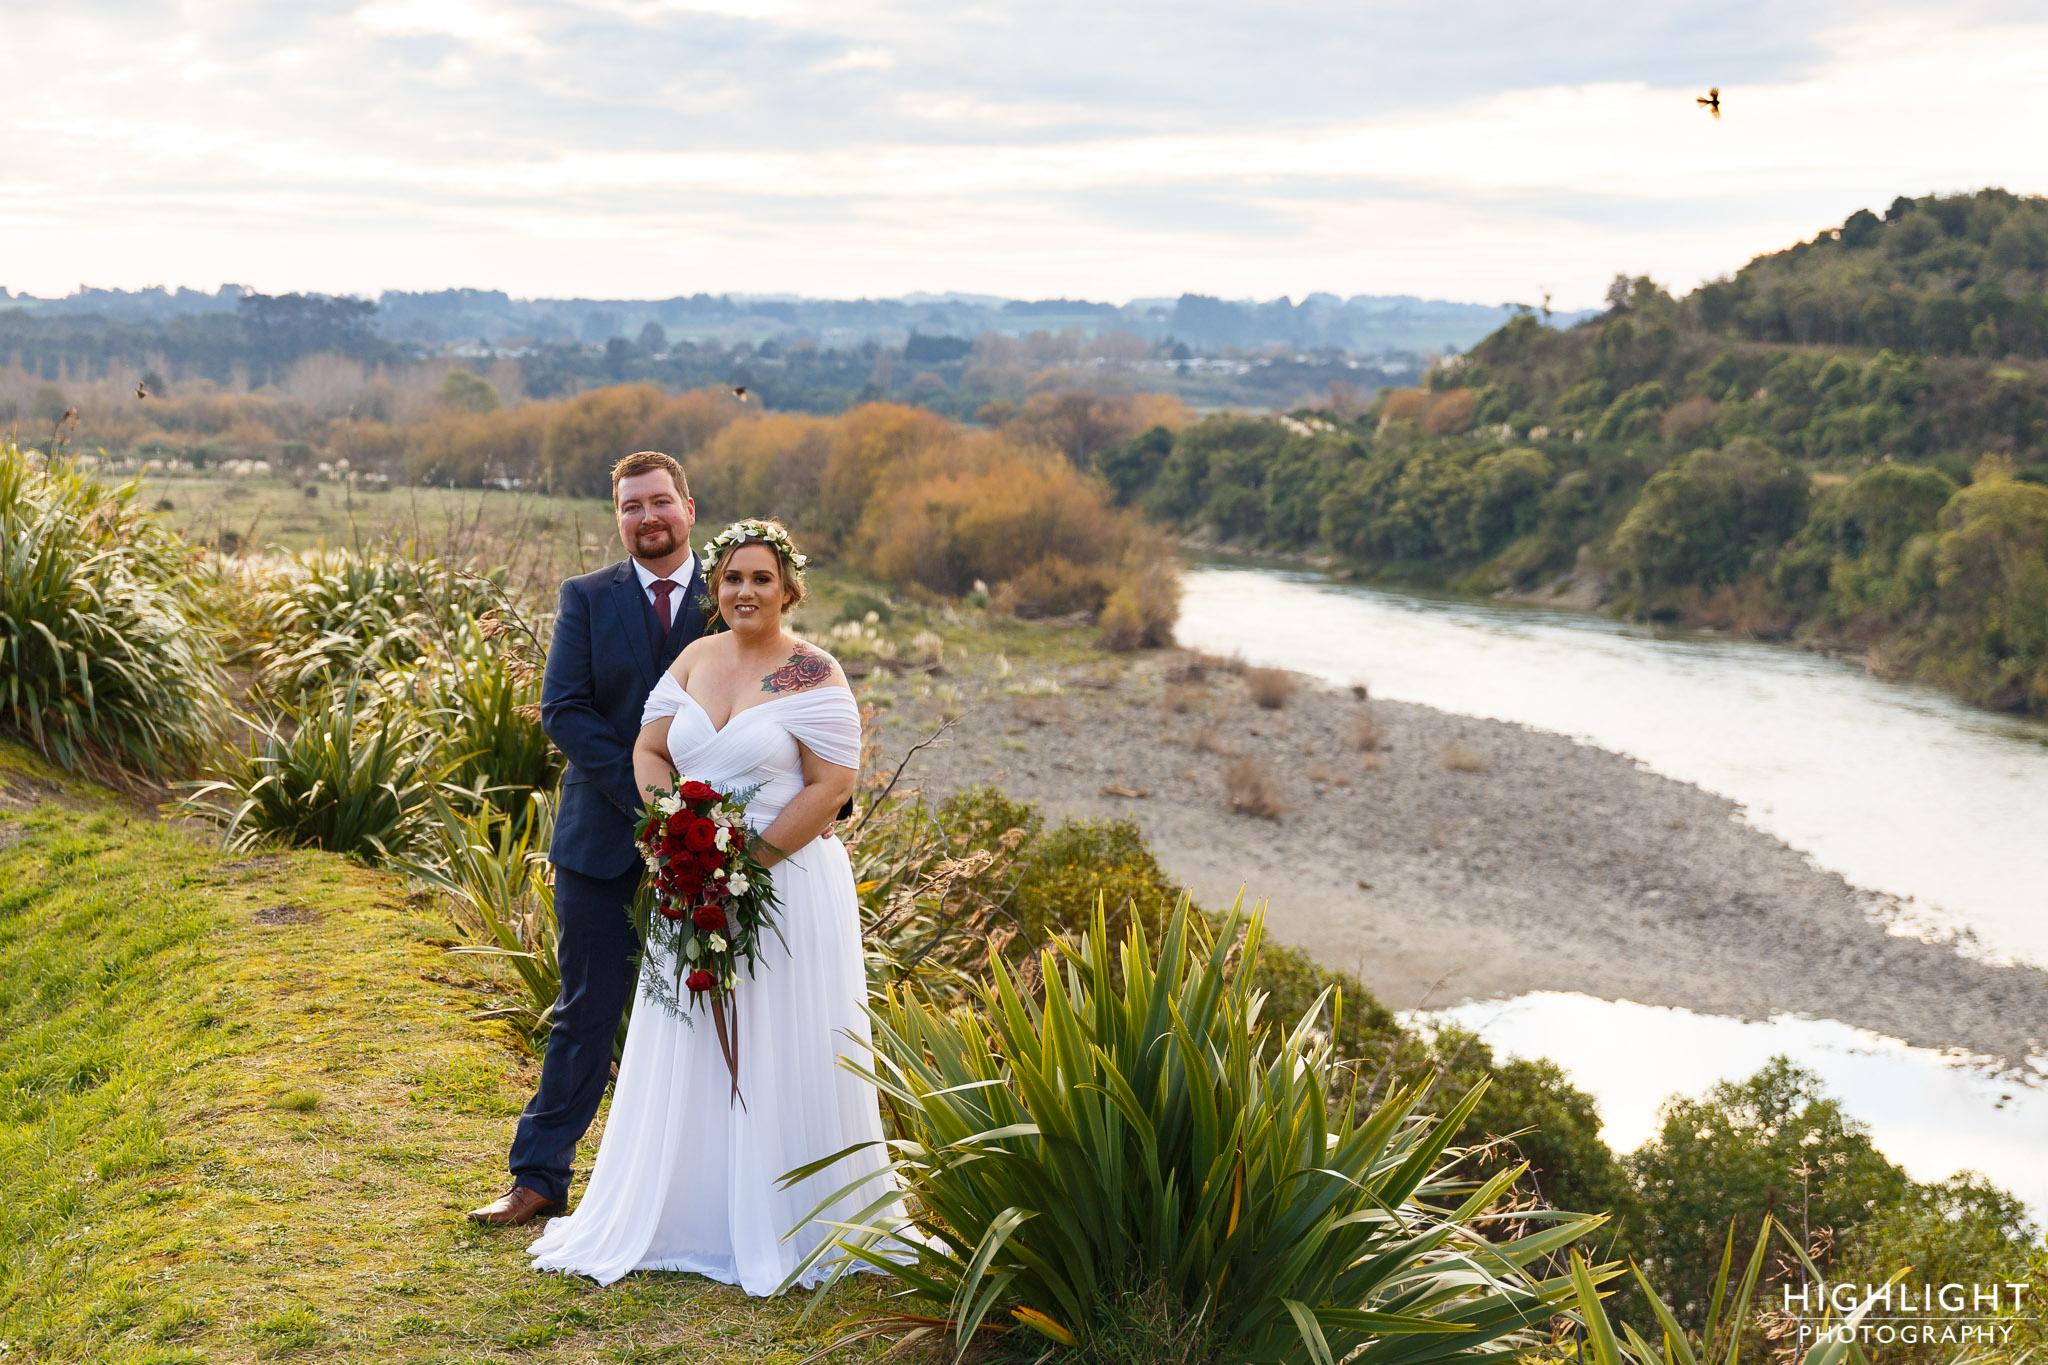 Highlight-wedding-photography-new-zealand-palmerston-north-86.jpg